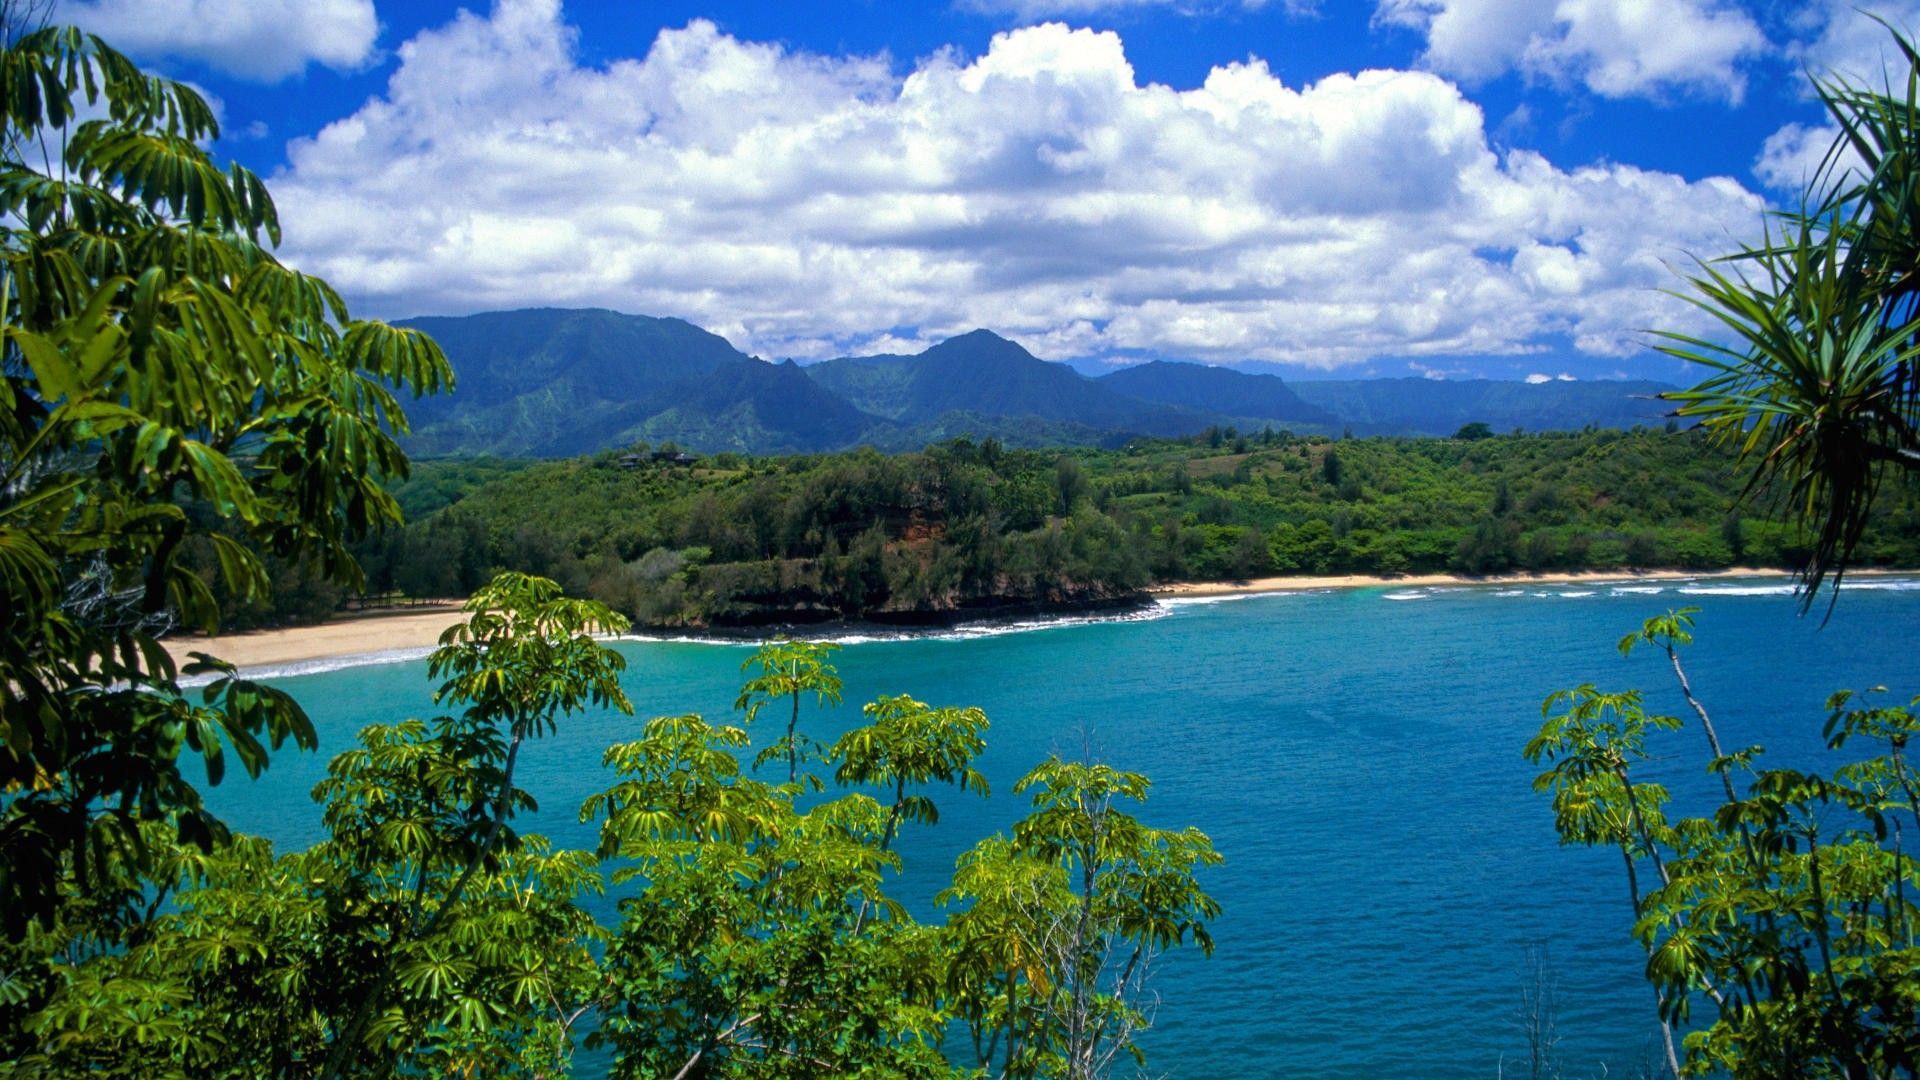 hawaii images wallpaper Download Beach World Hawaii